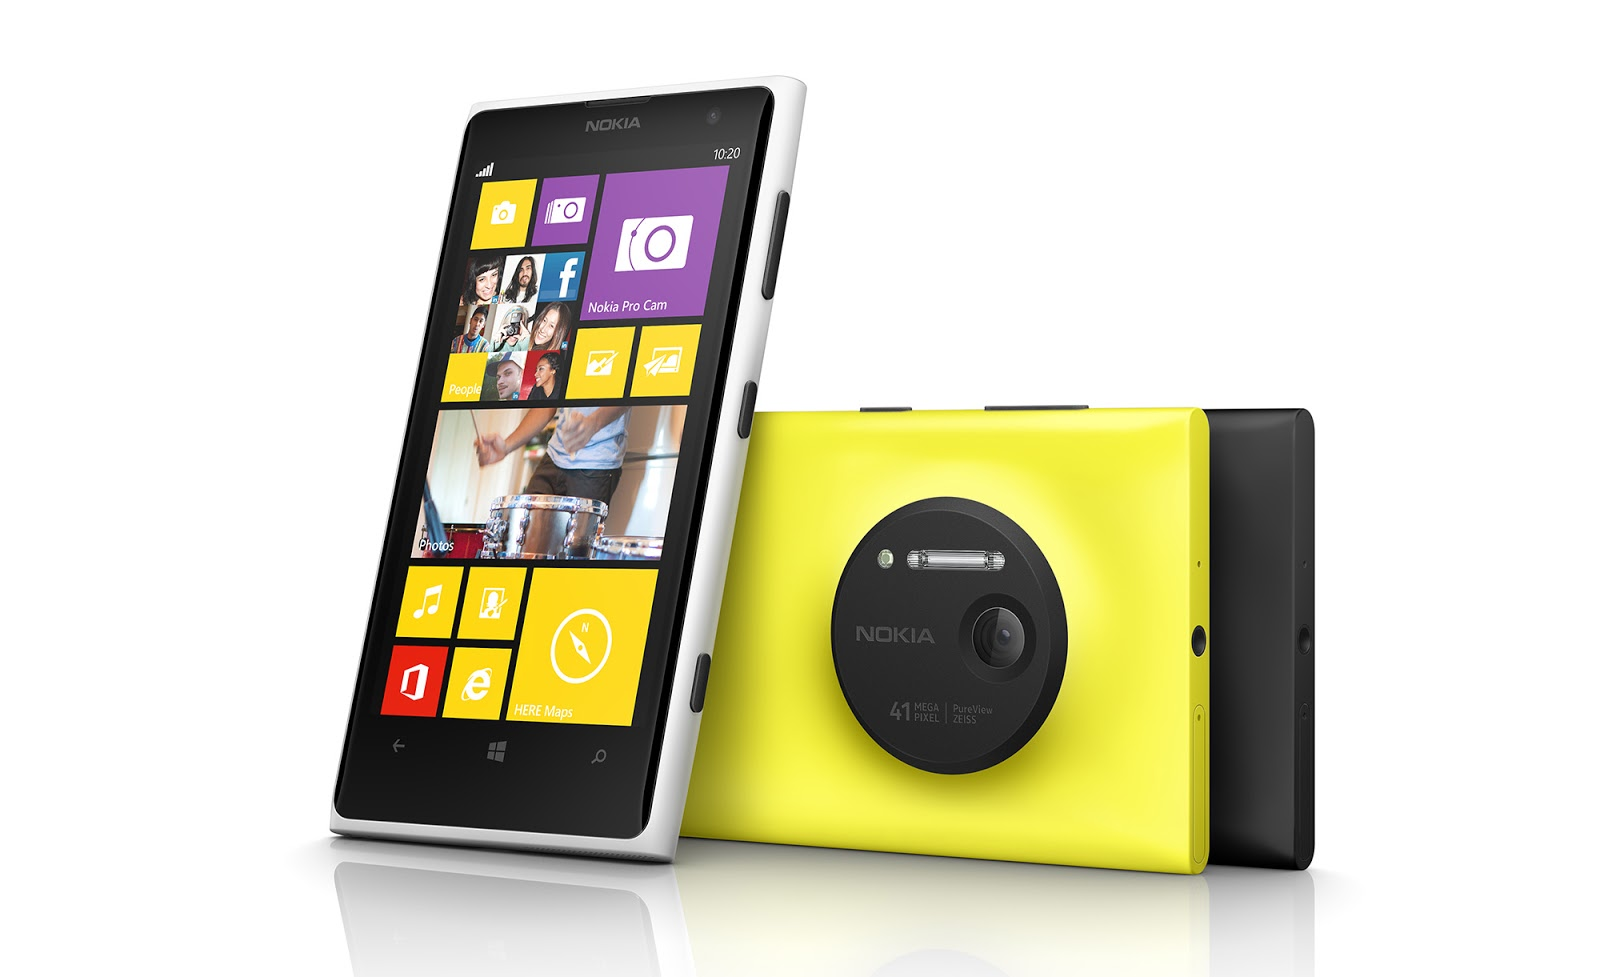 How To Unlock Nokia Lumia